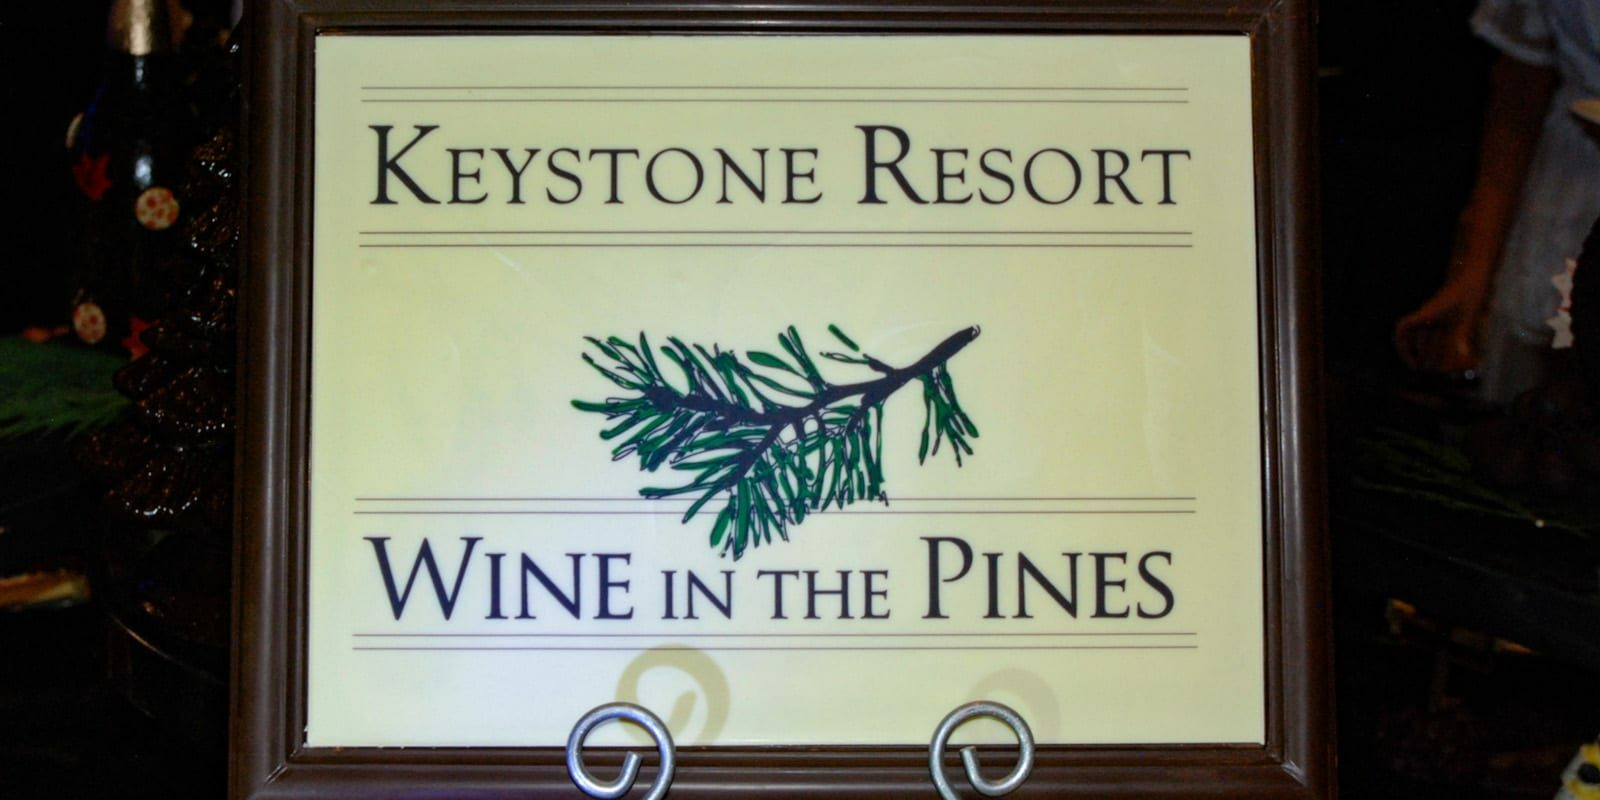 Keystone Resort Wine In The Pines